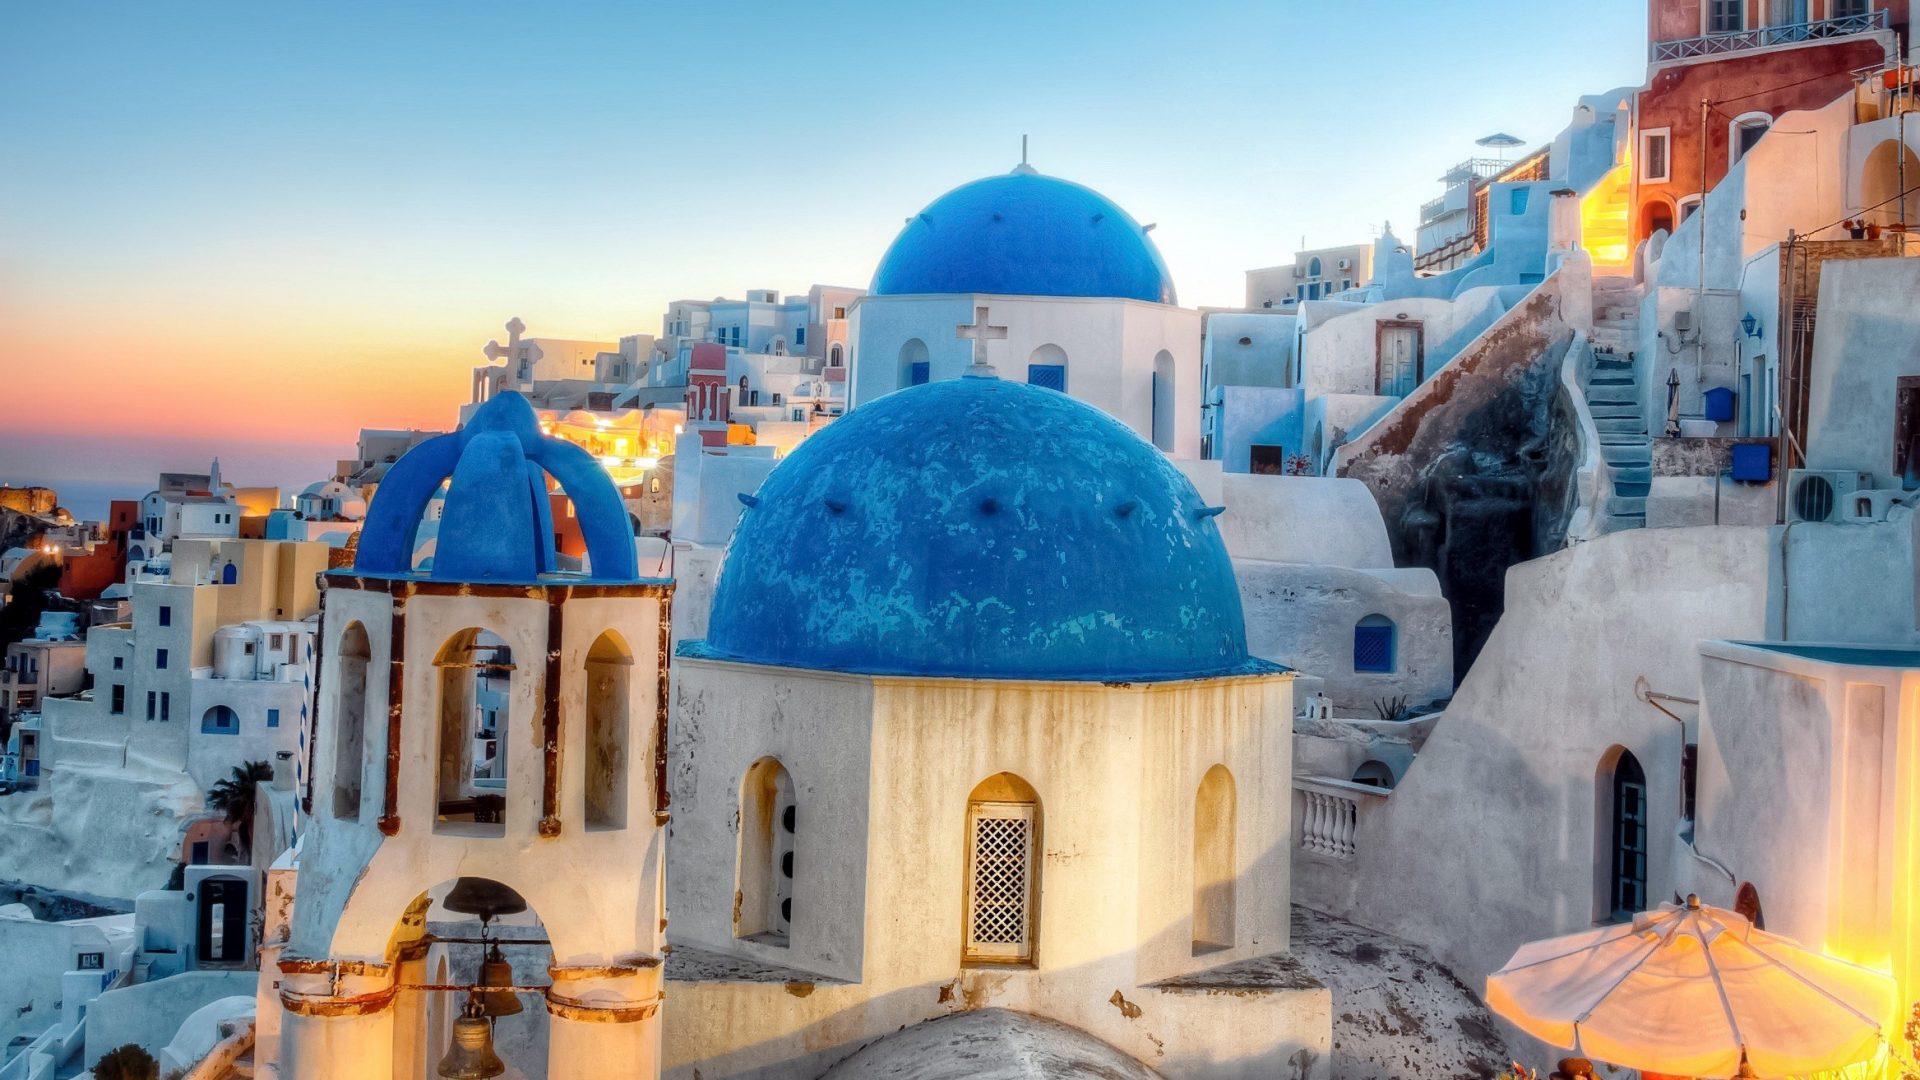 ArchitectureIMG-com-Santorini-Houses-Greece-City-1080p-wallpaper-wp3602686